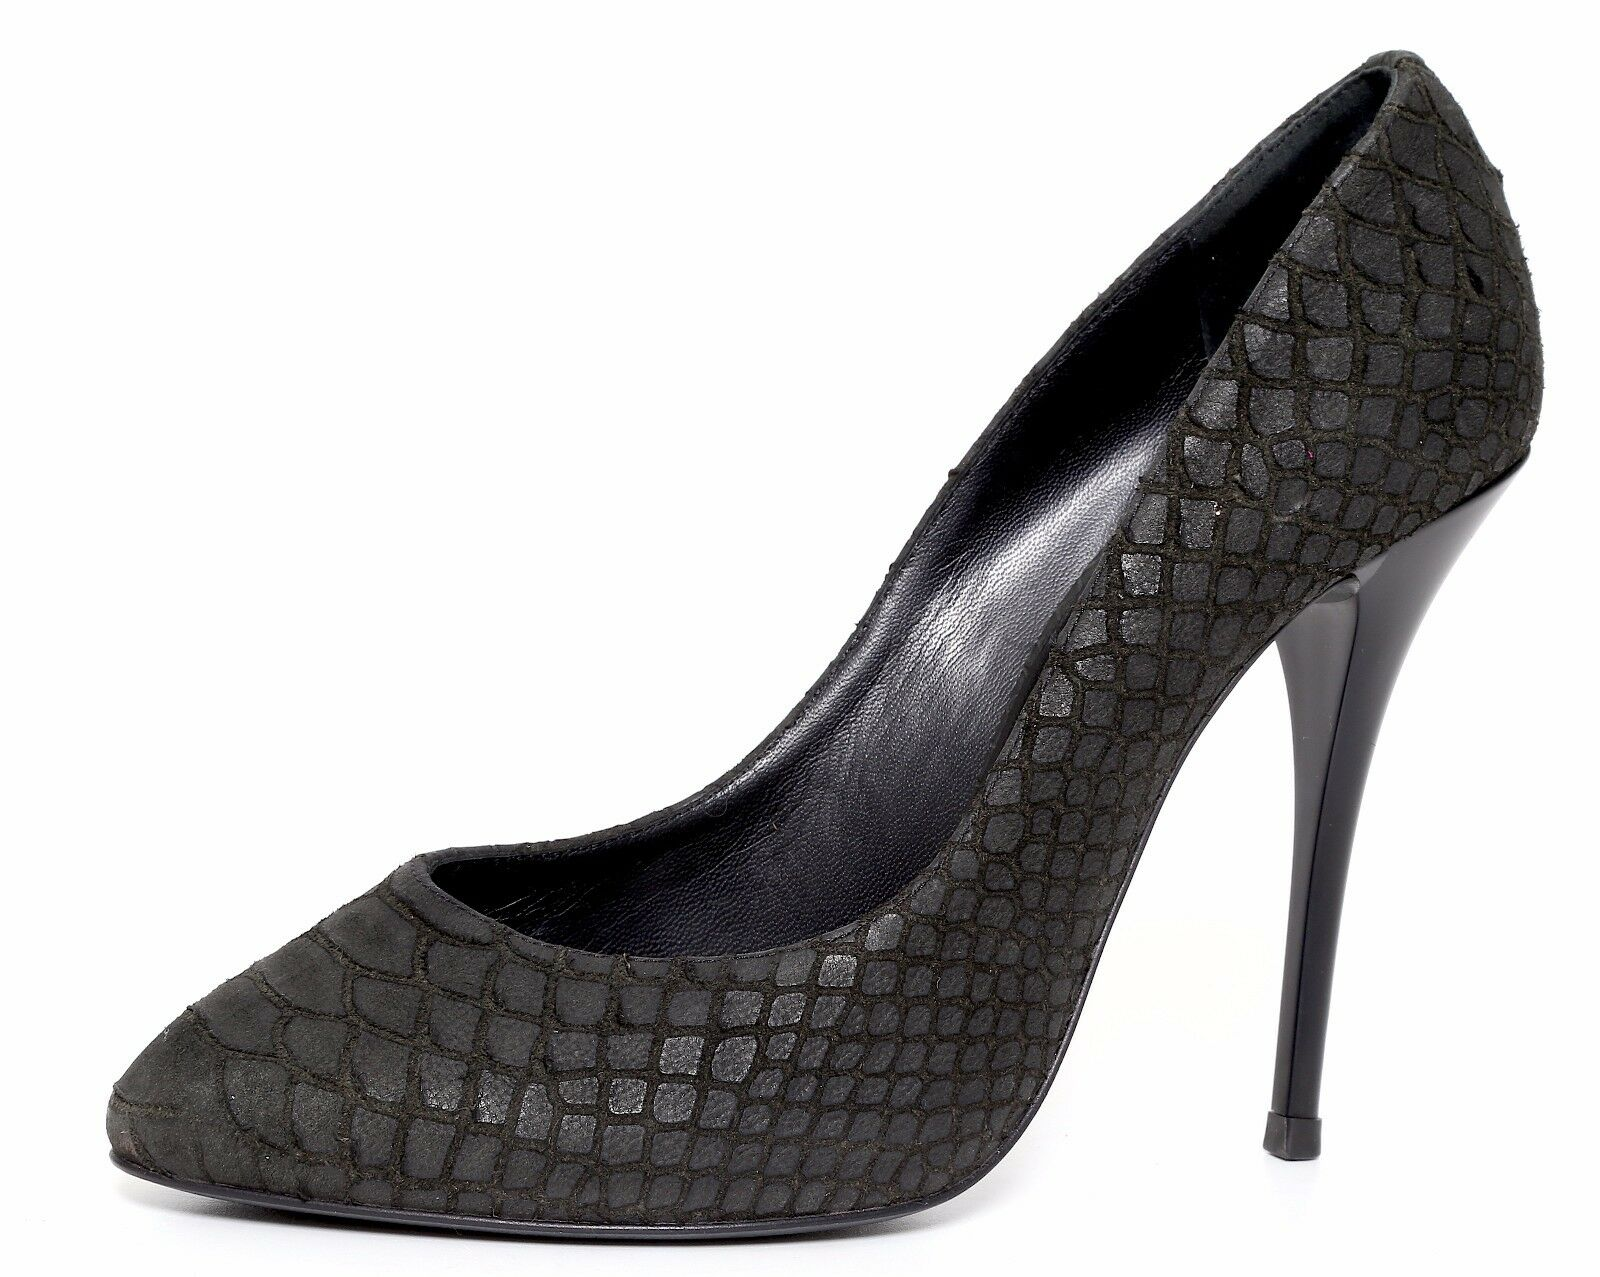 Giuseppe Zanotti Design Bomba De Mujer Negro Tamaño 38.5 EUR EUR EUR 4198  tienda de venta